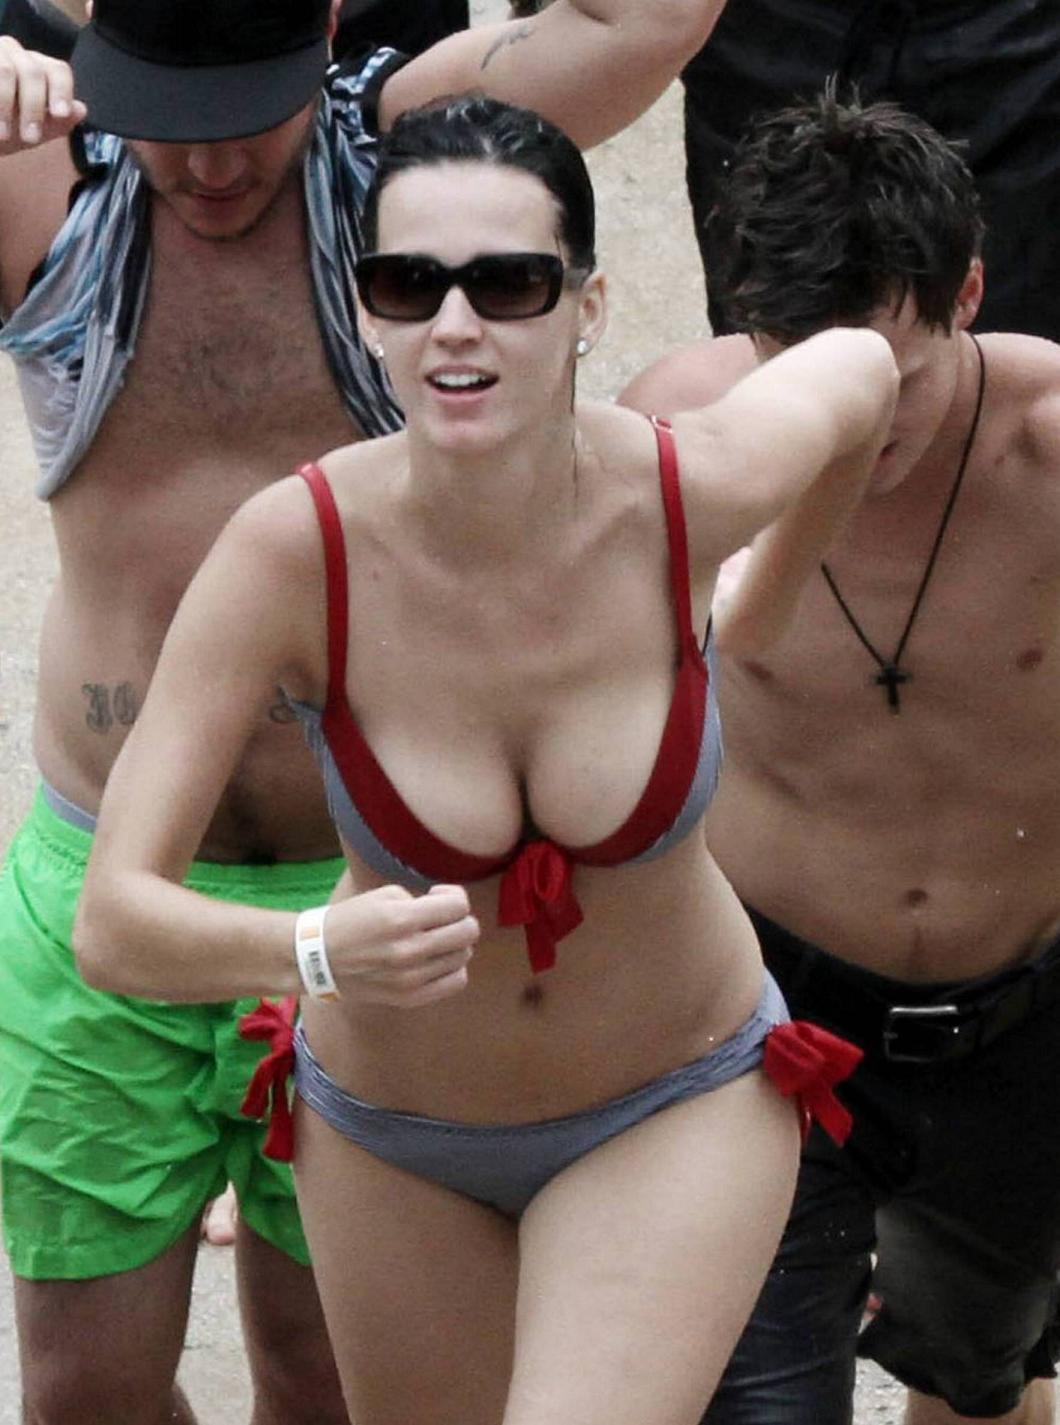 http://3.bp.blogspot.com/-uJZmEHpRwlc/T0nJfs_nghI/AAAAAAAAE74/wEmdl5HqIPc/s1600/katy-perry-redstripedbikini1.jpg